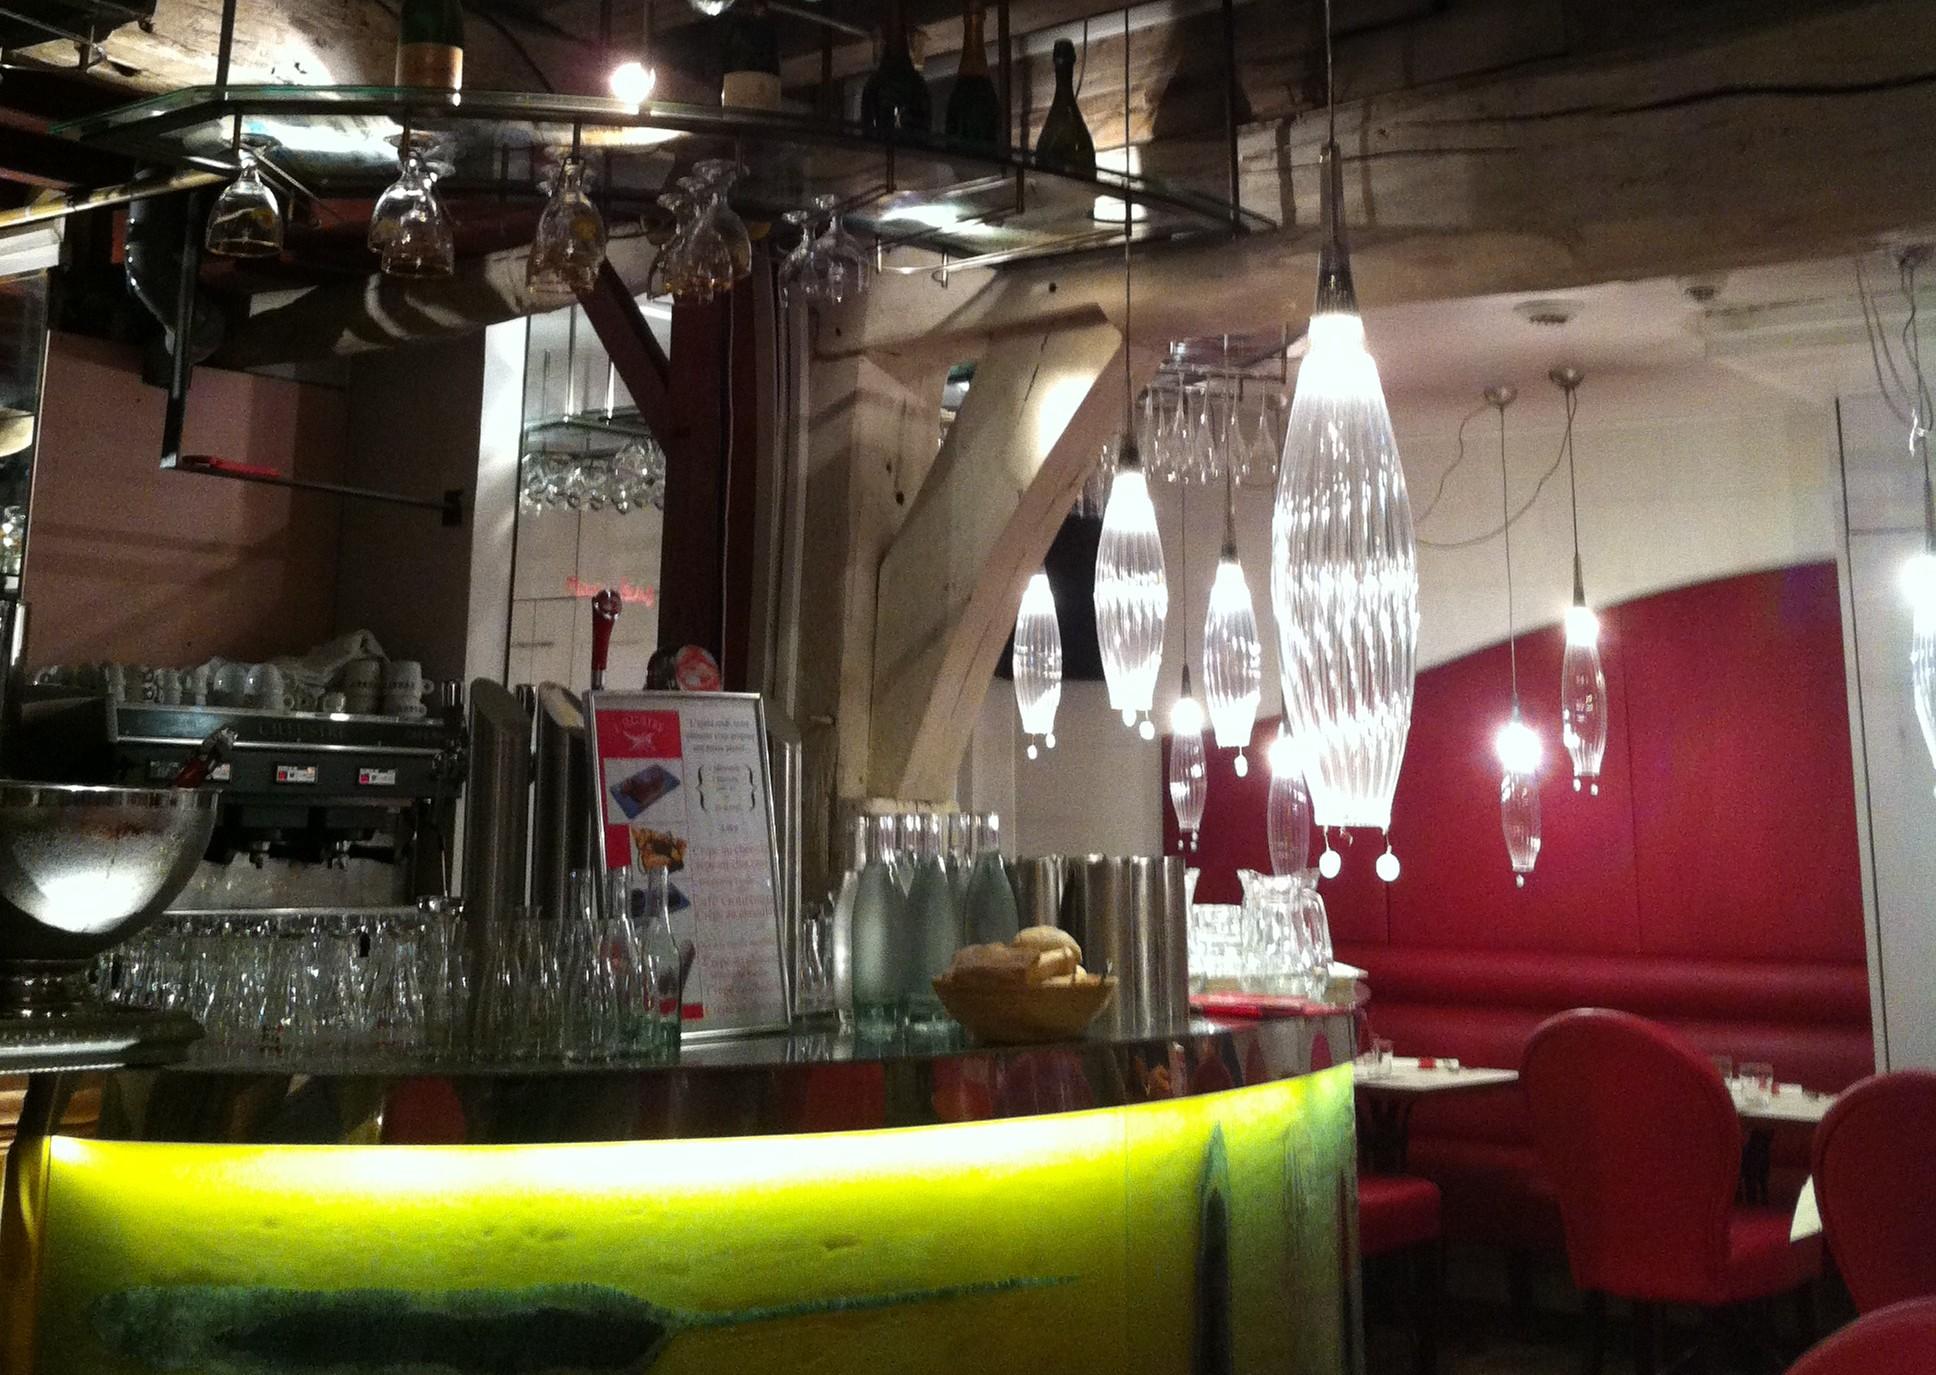 Bar rencontre valenciennes